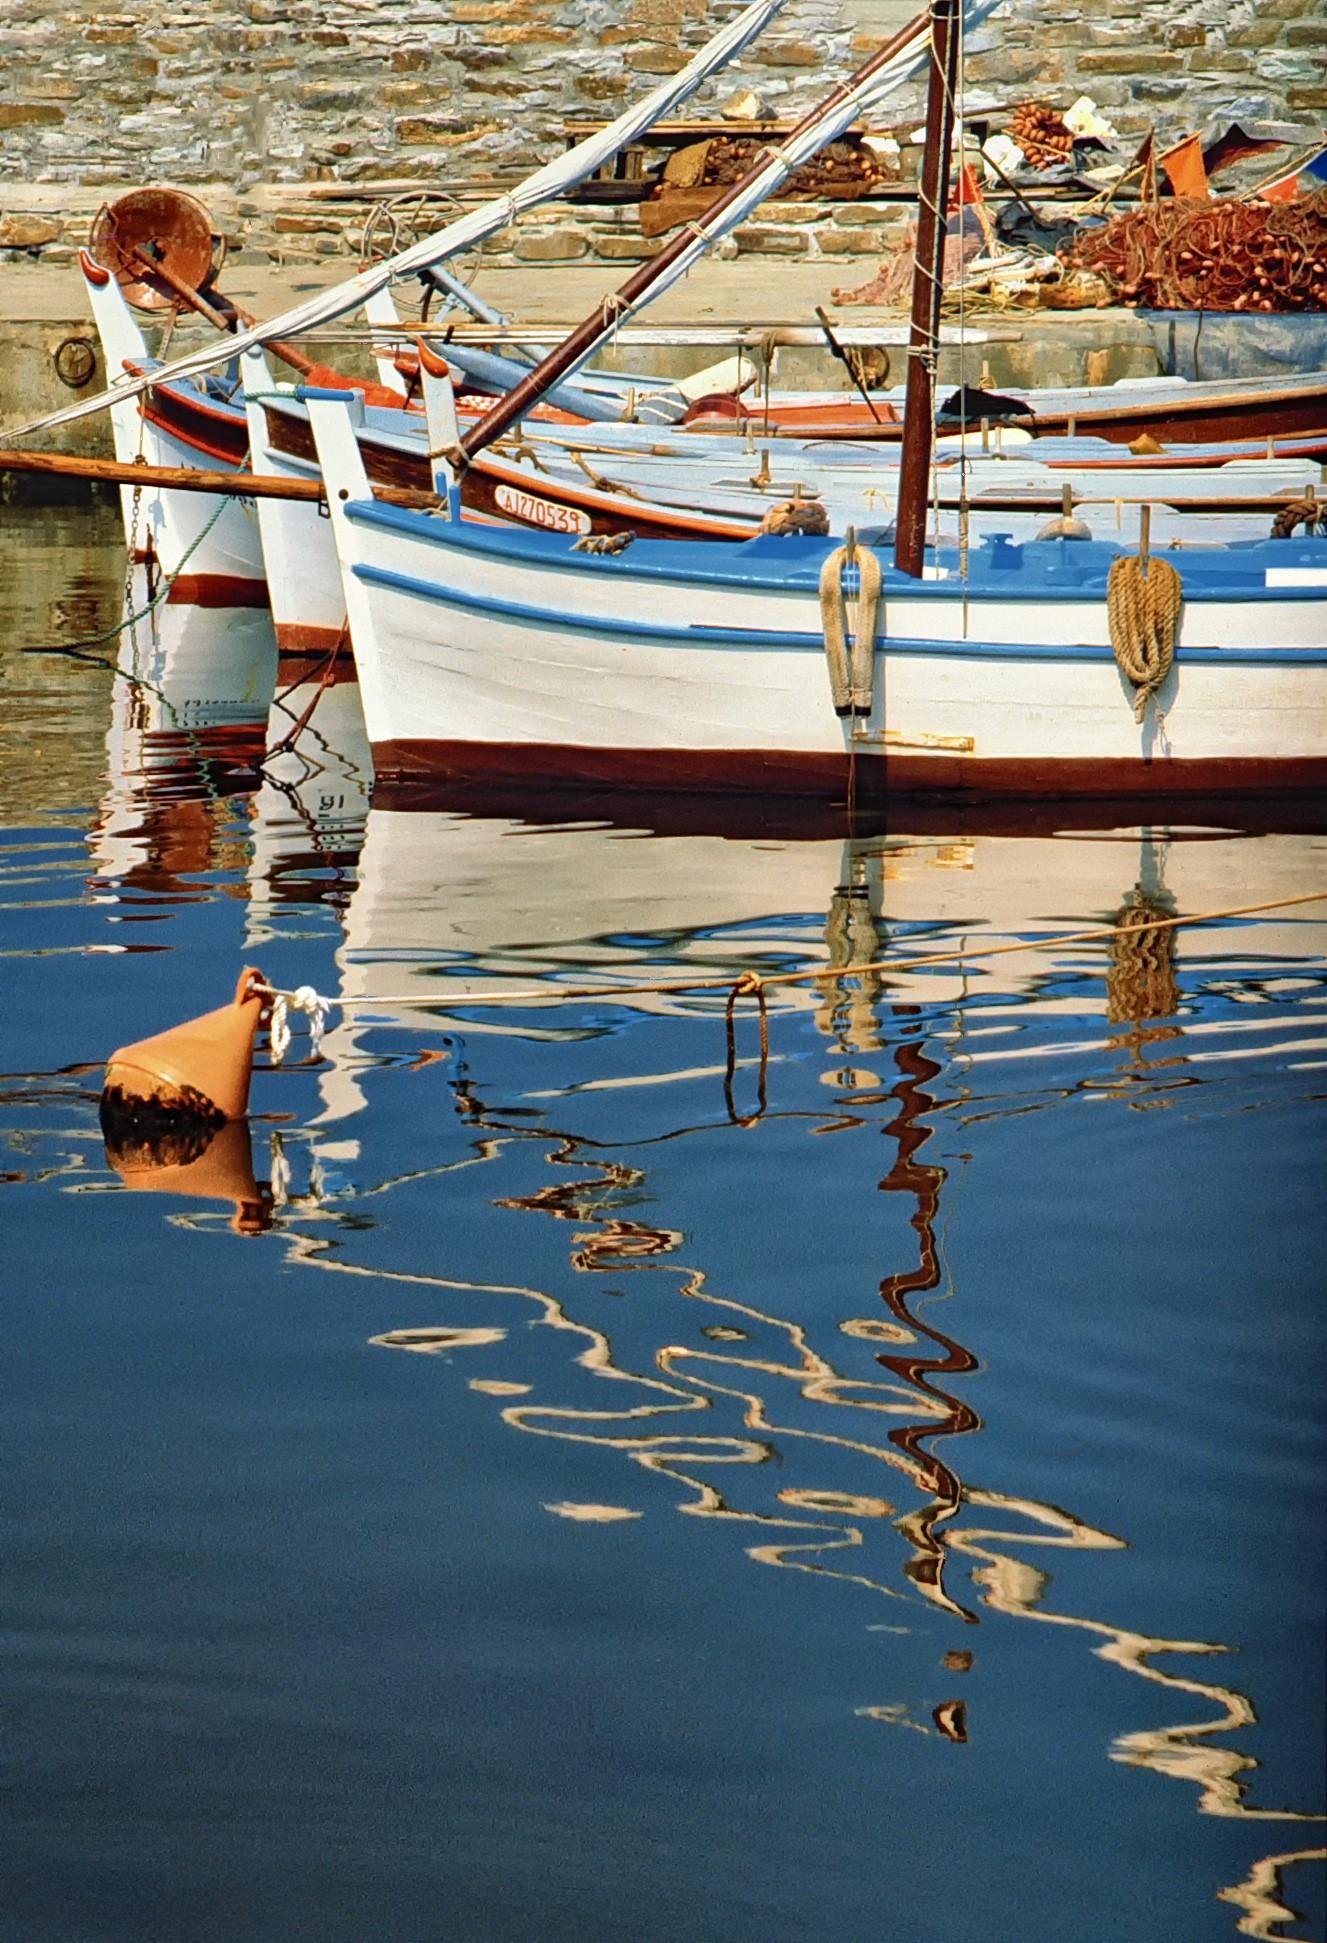 Лодки. Эрбалунга, Корсика, Франция, 1980. Фотограф Эрик Хайбрехтс